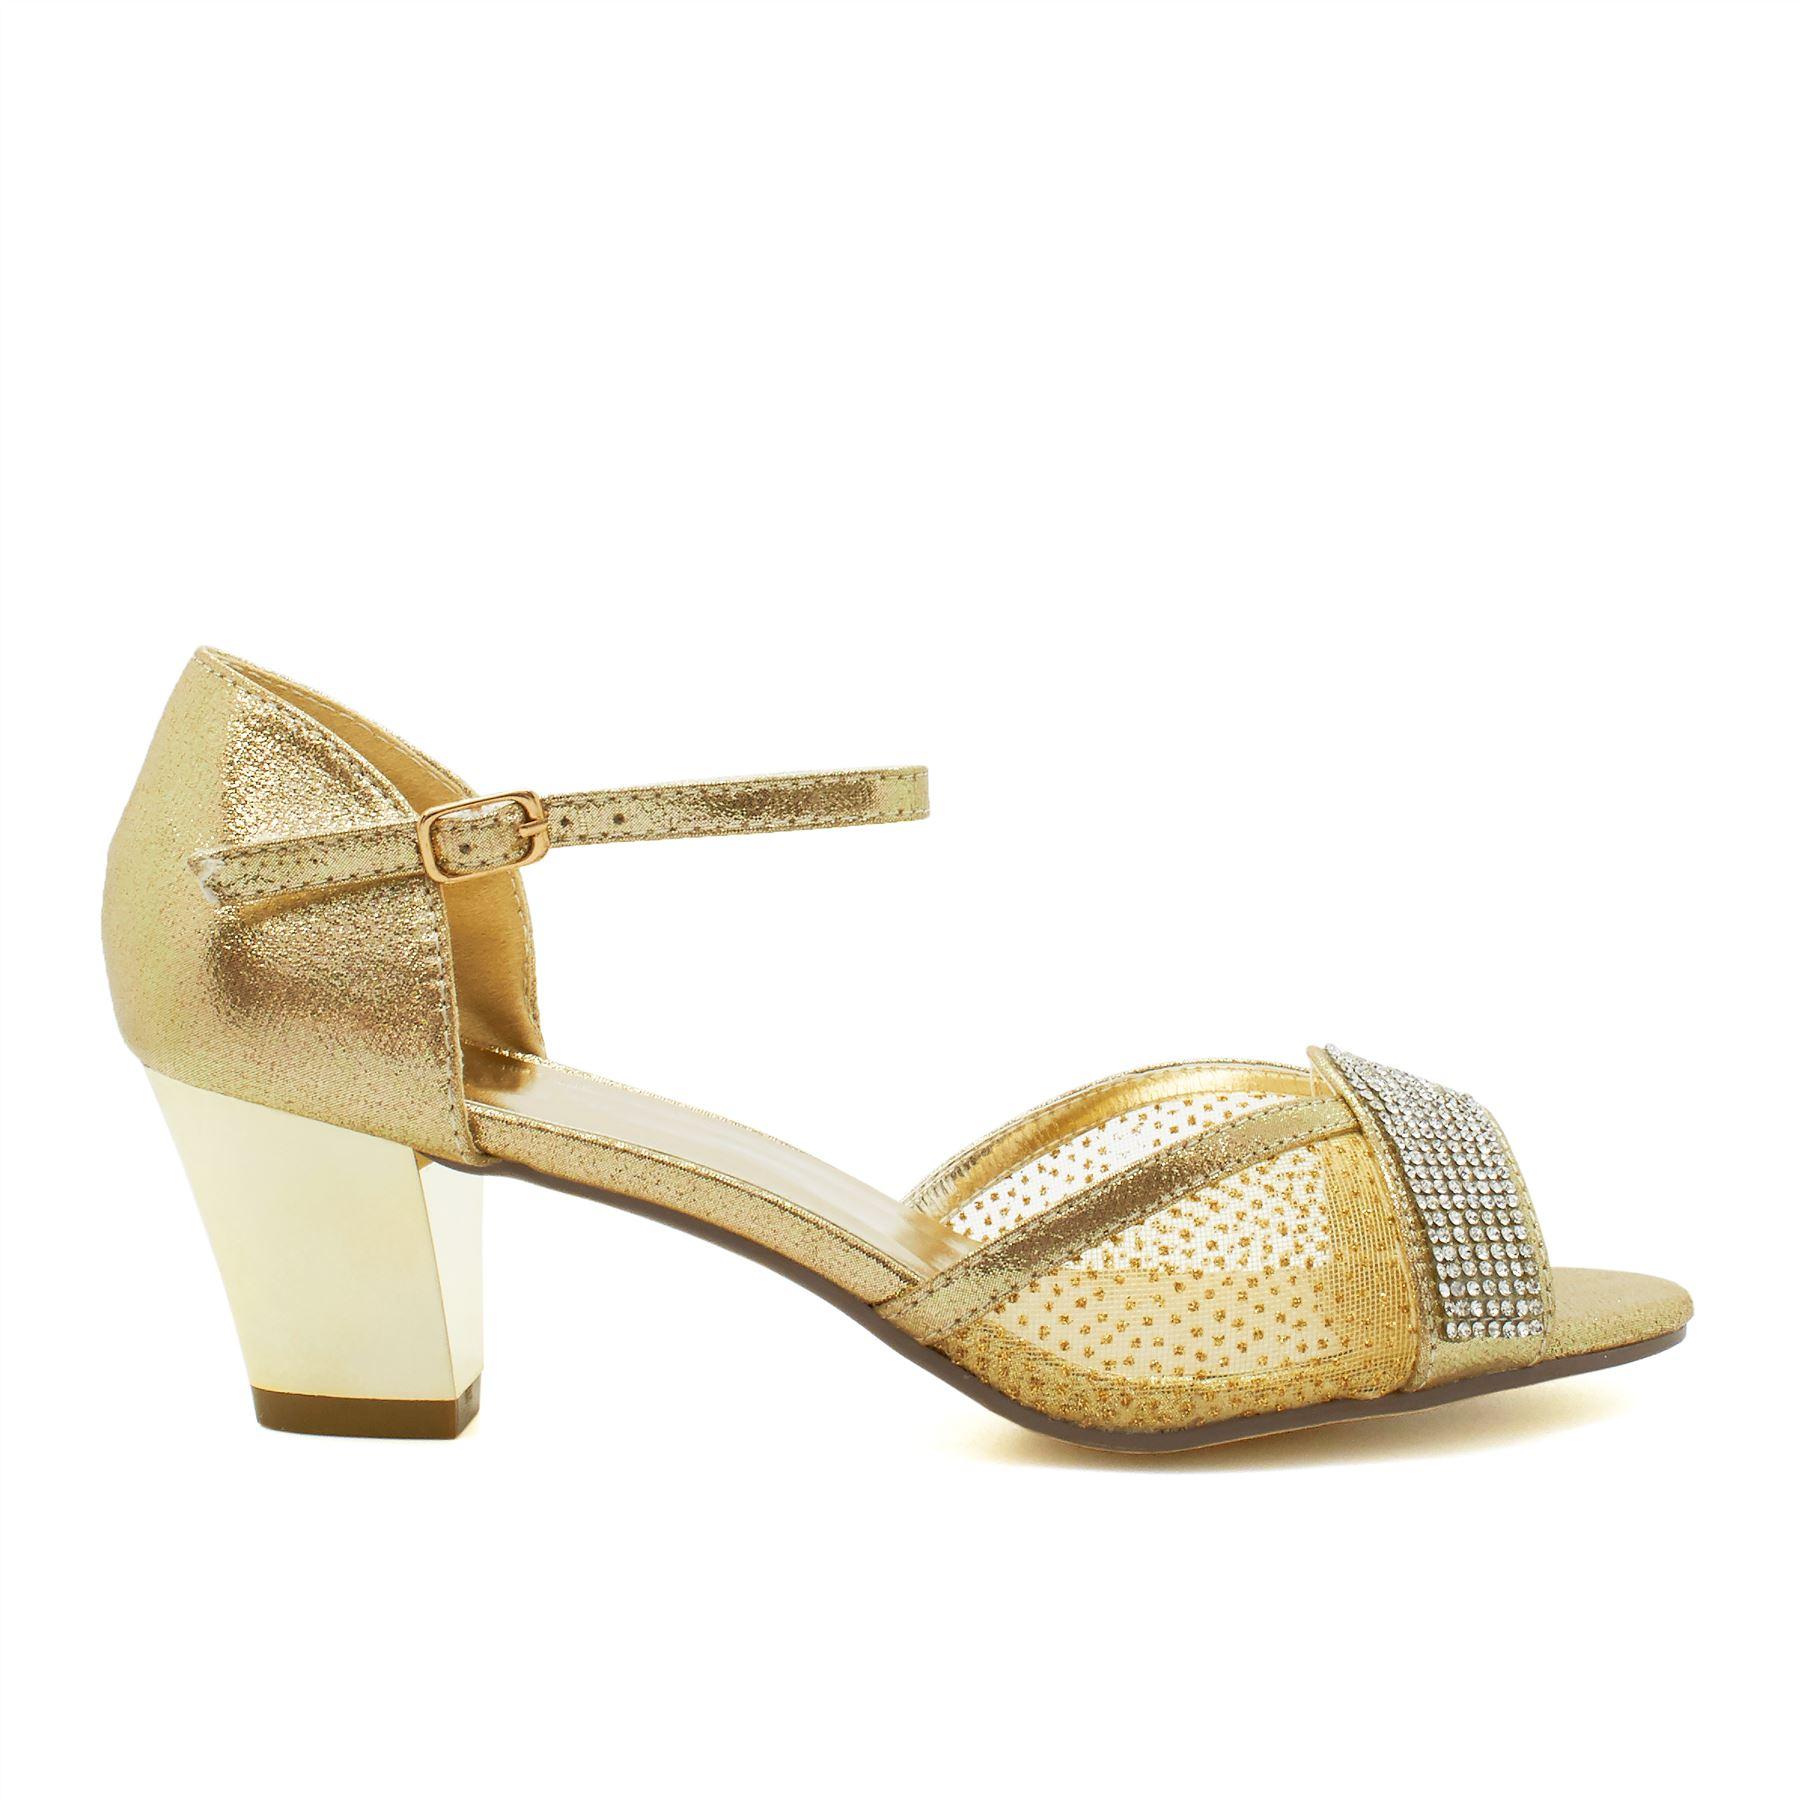 ab632c17931 New Womens Low Kitten Heel Bridal Diamante Sandals Ladies Strappy ...